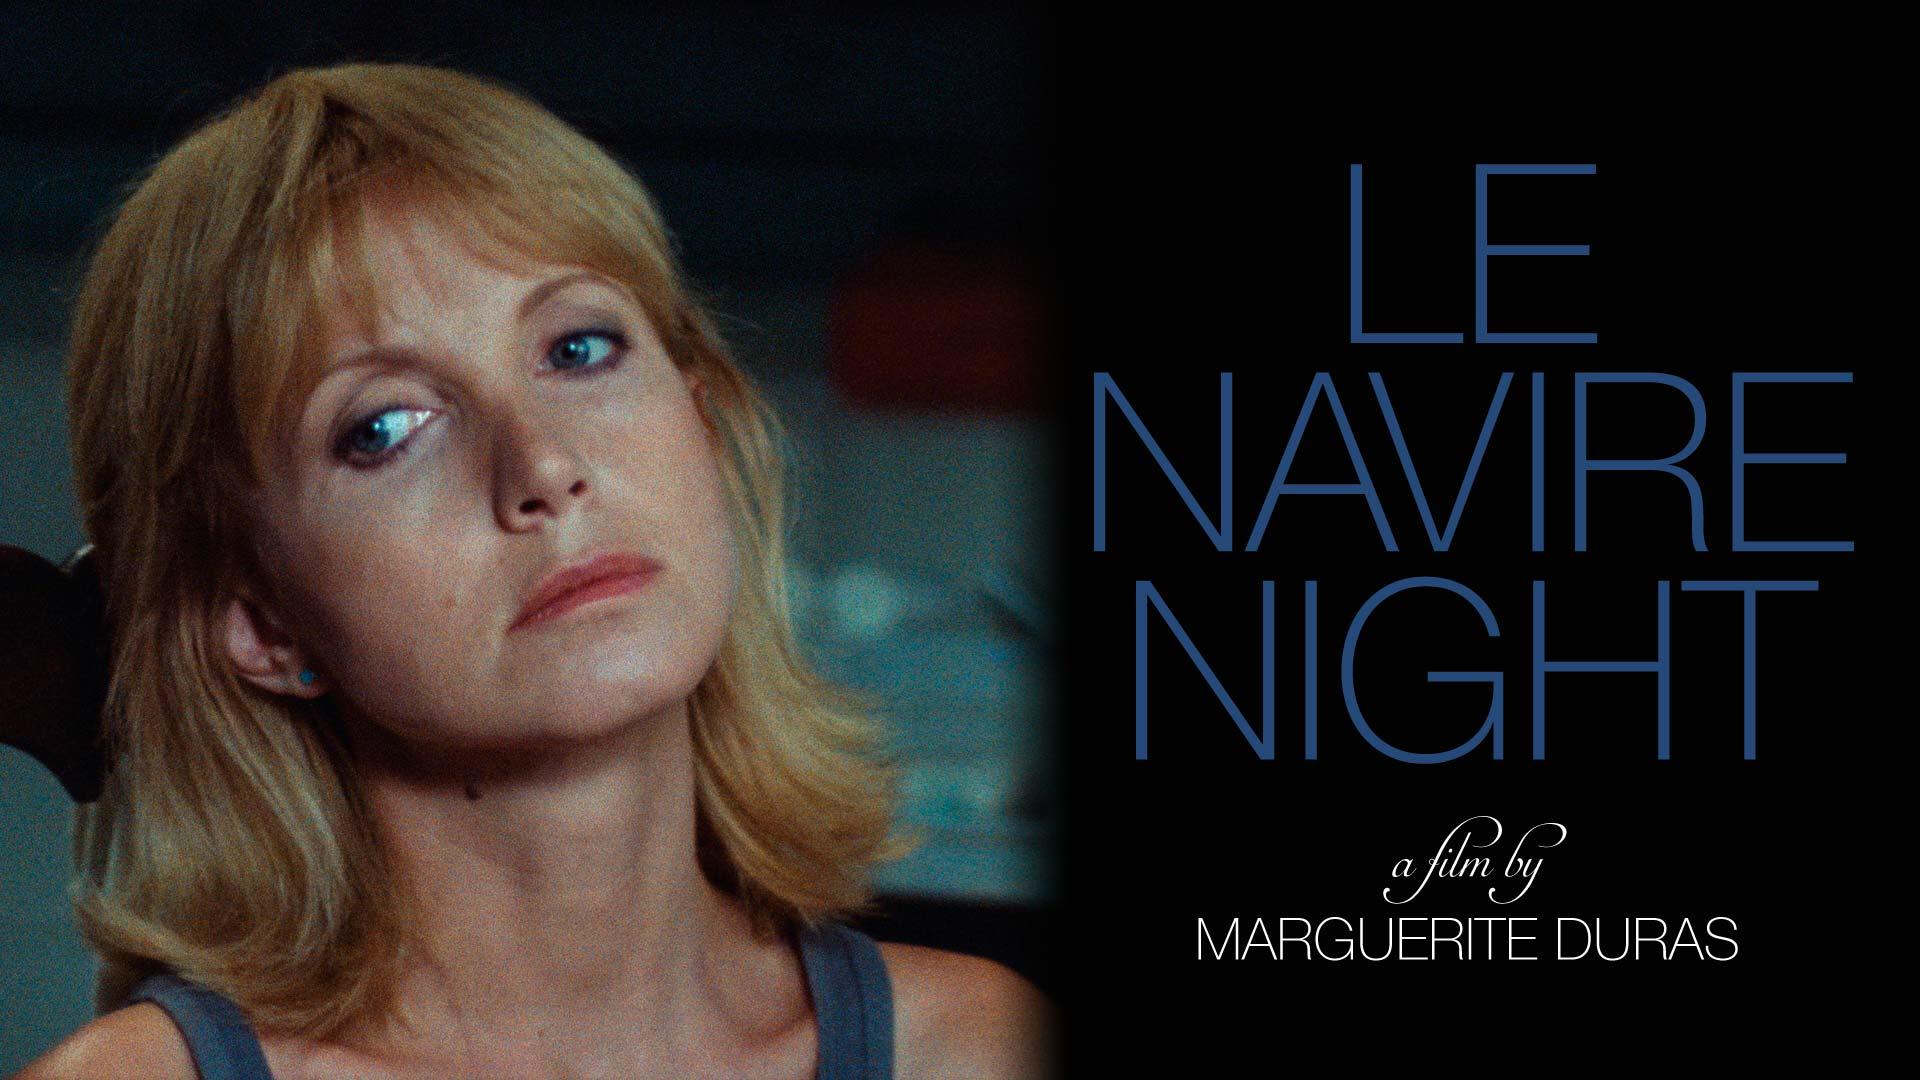 Le Navire Night - image